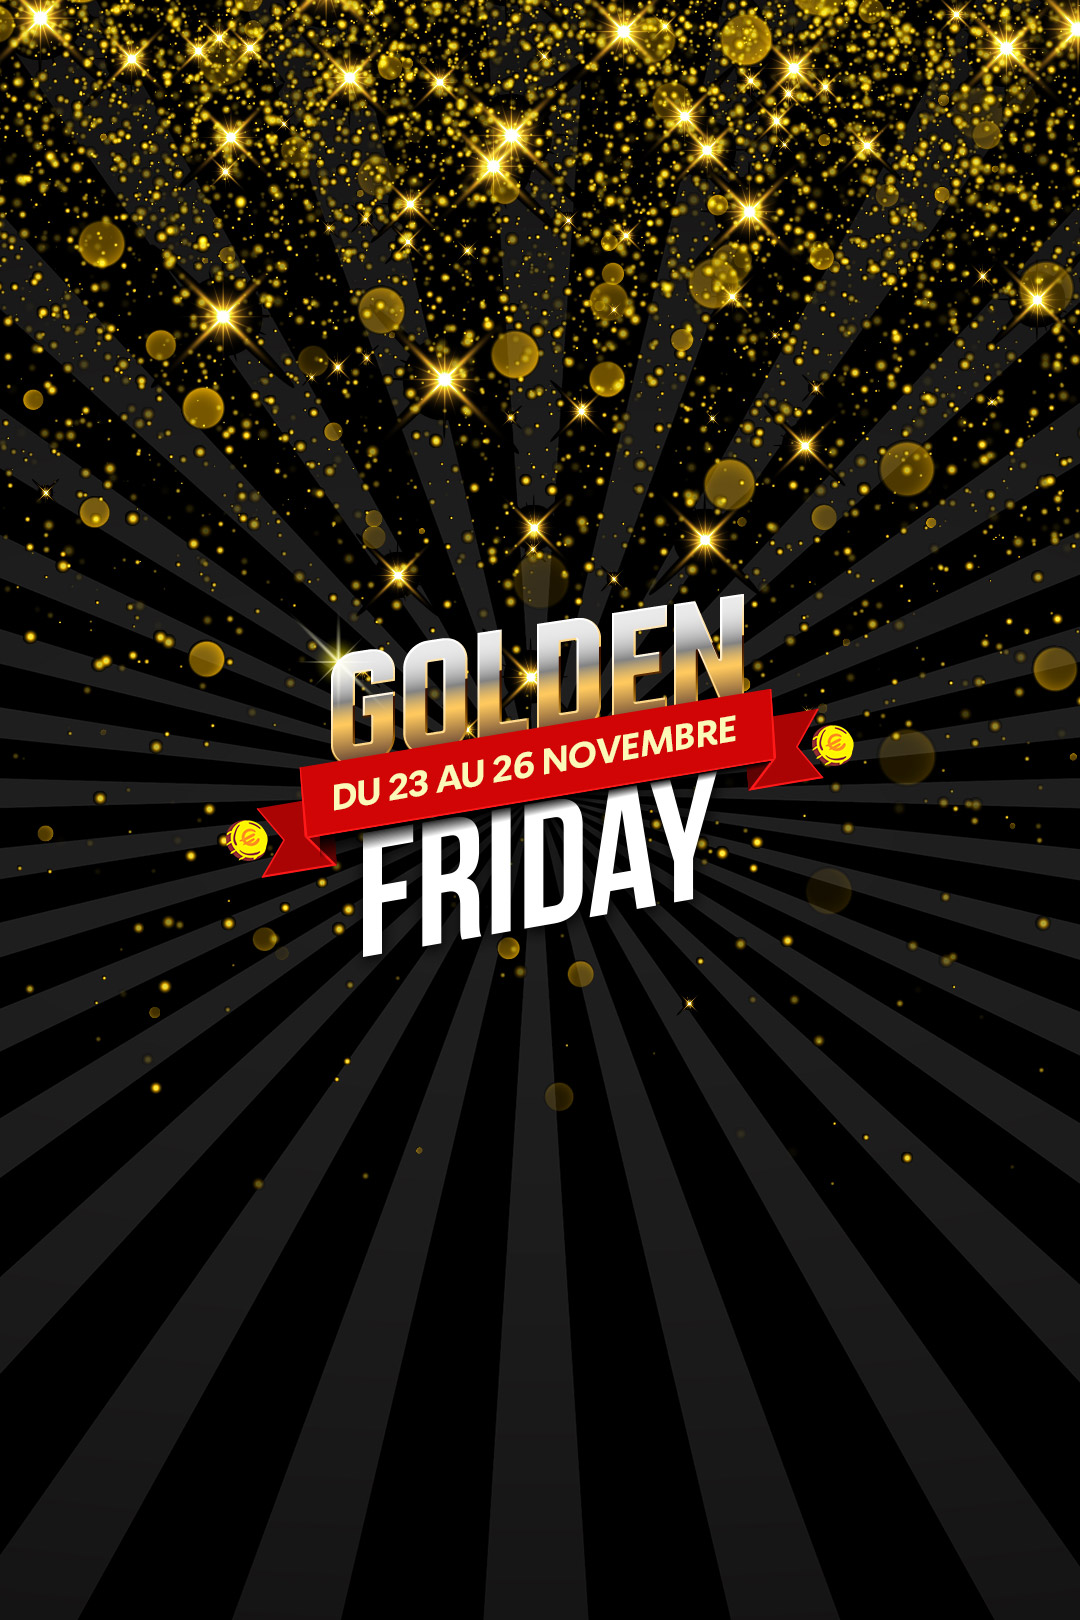 Golden Friday